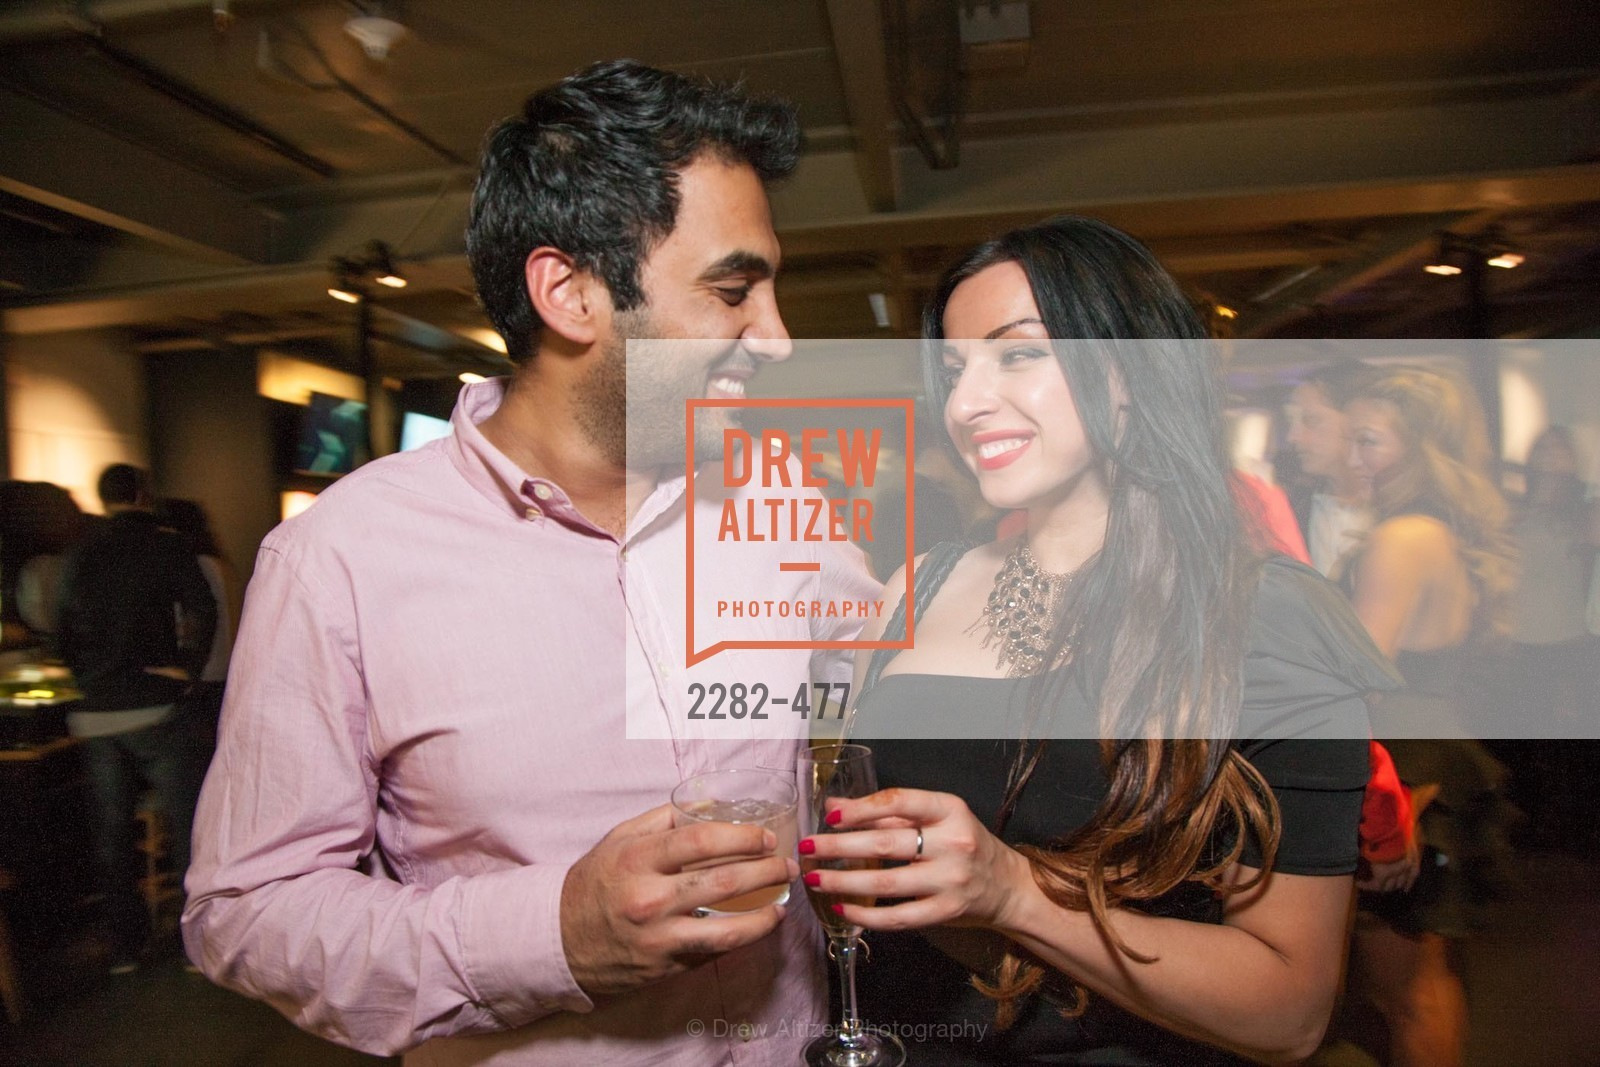 Karam, Elena, THE EXPLORATORIUM LAB Presents 2014 Science of Cocktails, US. US, January 24th, 2014,Drew Altizer, Drew Altizer Photography, full-service agency, private events, San Francisco photographer, photographer california